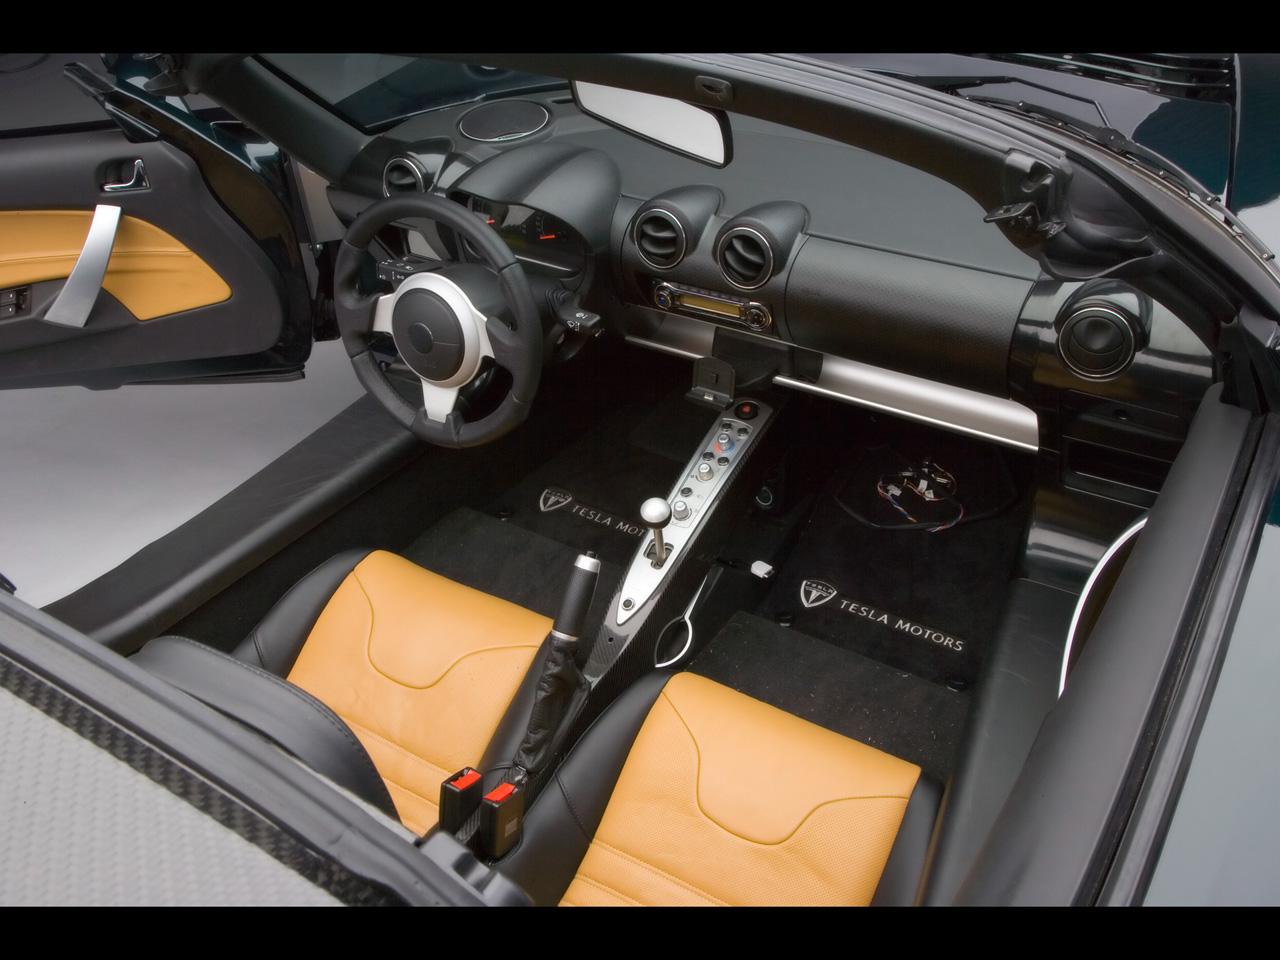 2008-Tesla-Roadster-Interior-1280x960.jpg